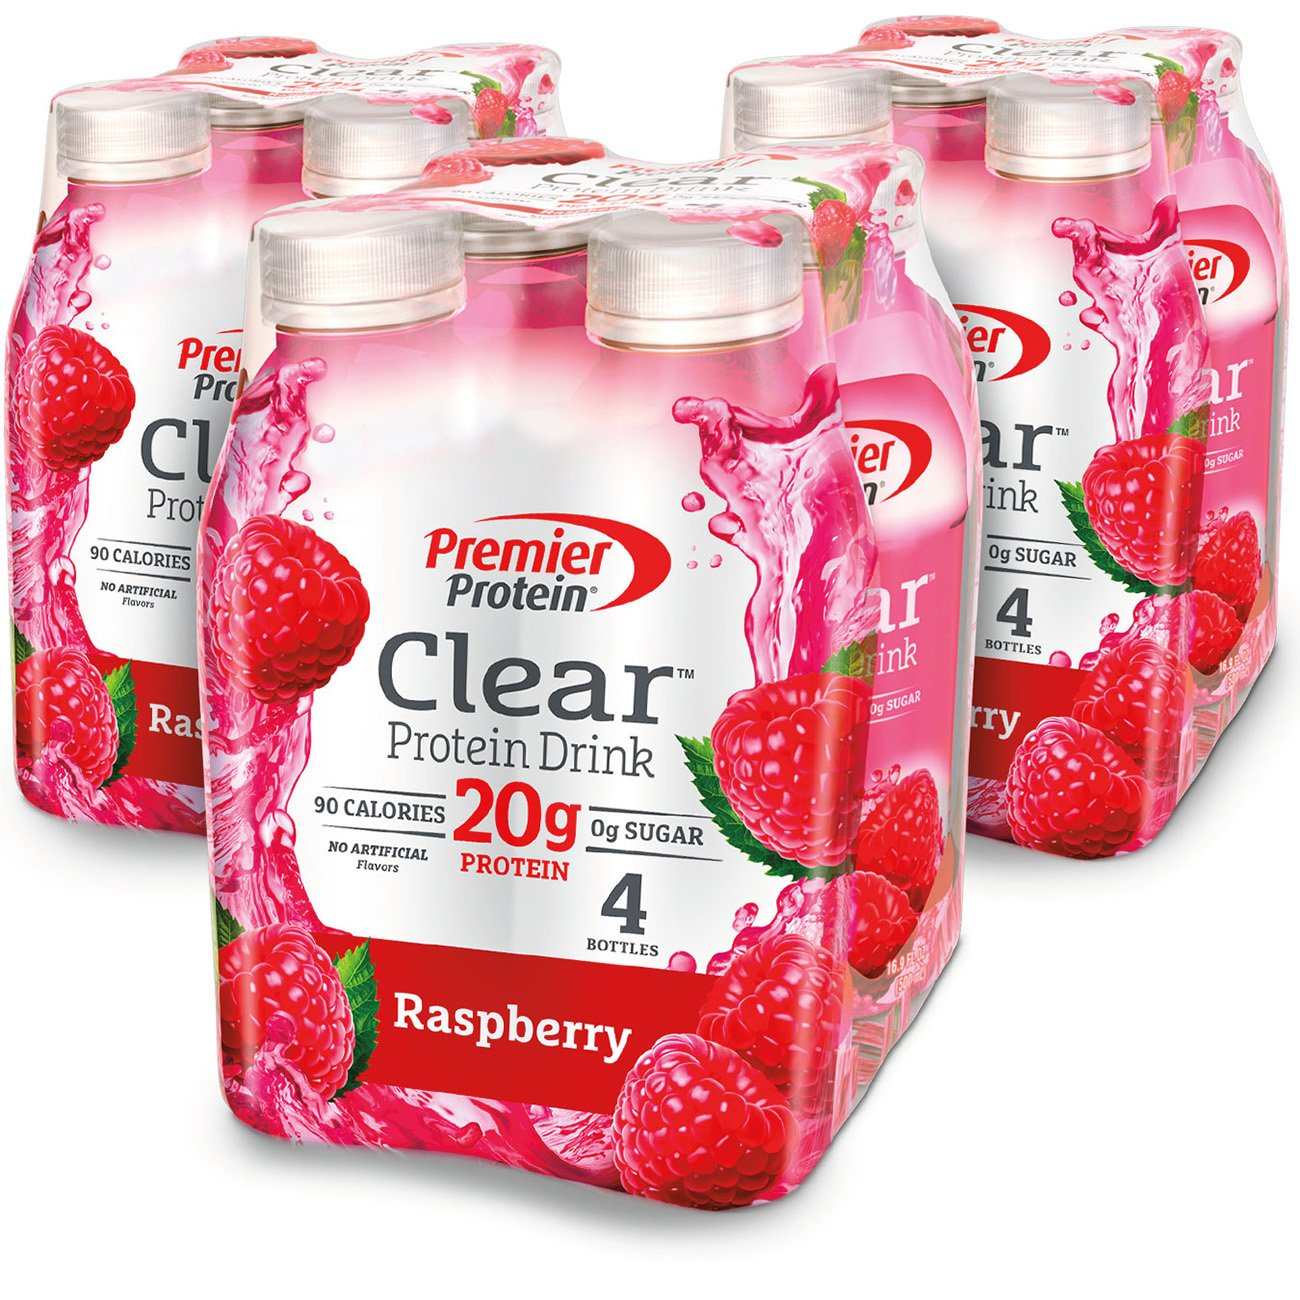 Premier Protein Clear Drink, Raspberry, 16.9 fl oz Bottle, (12 Count)